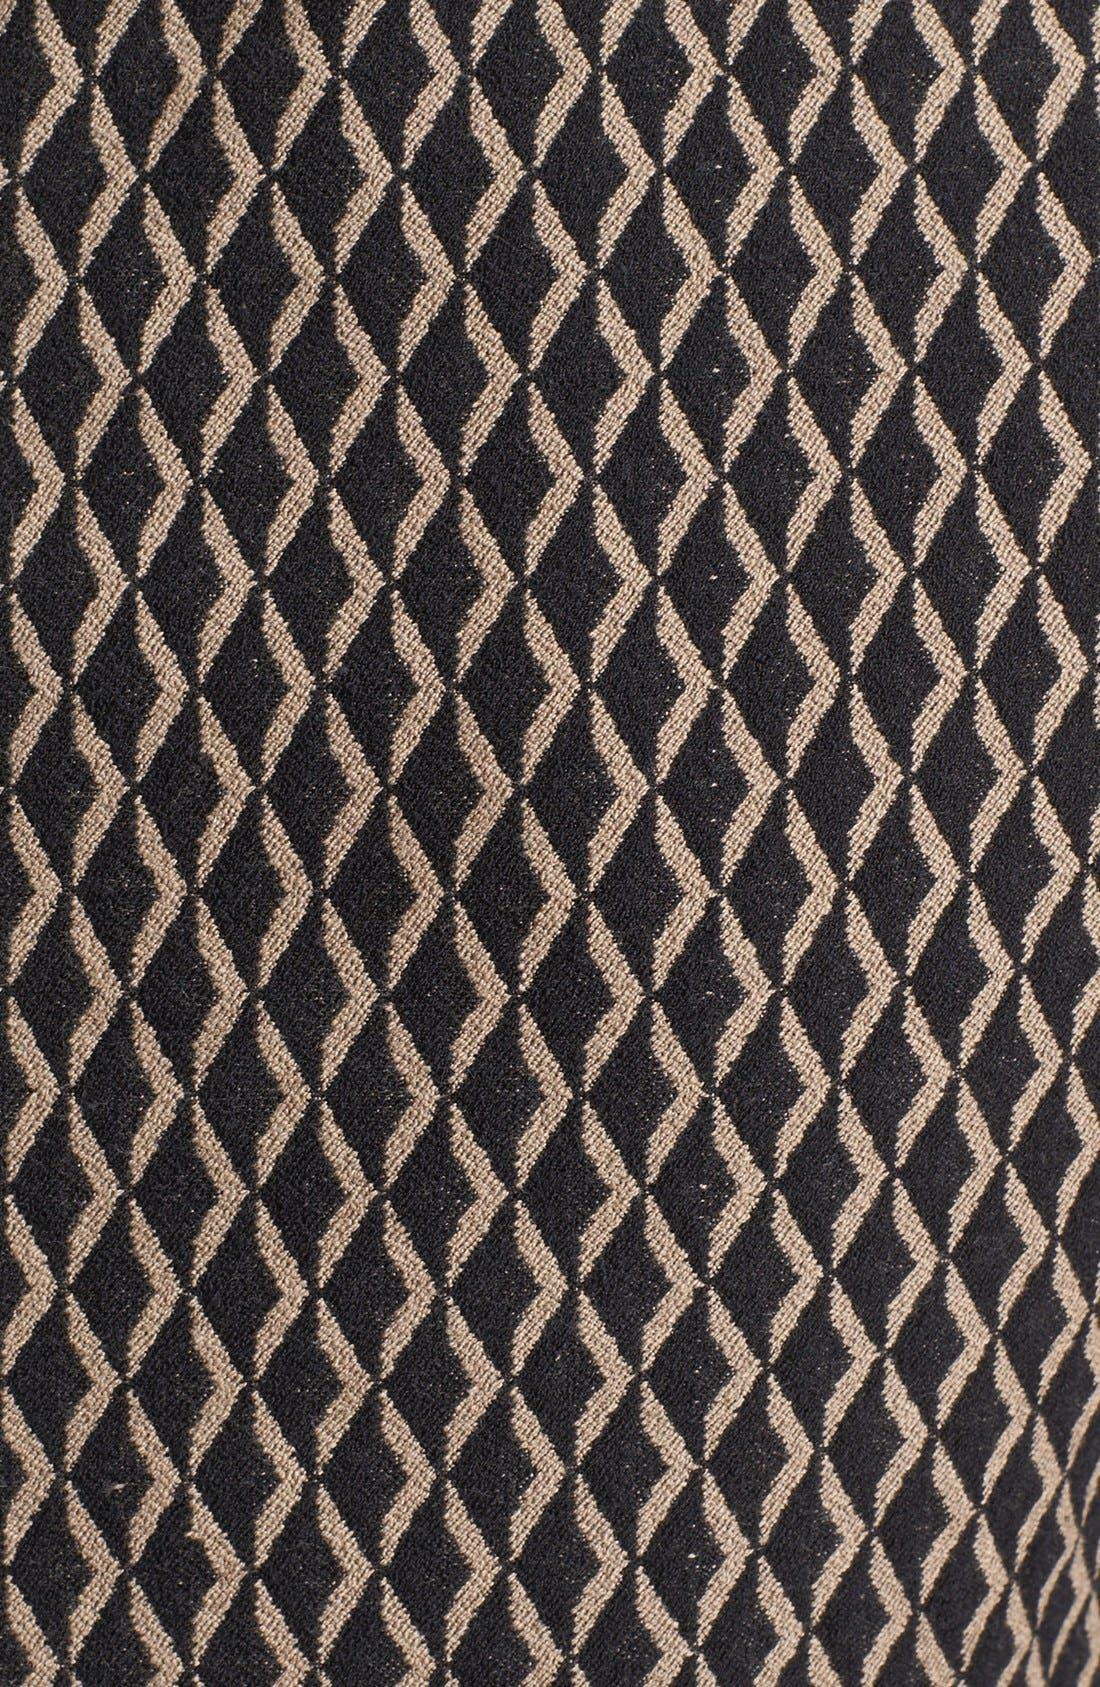 Alternate Image 3  - Vince Camuto Diamond Print Sleeveless Peplum Blouse